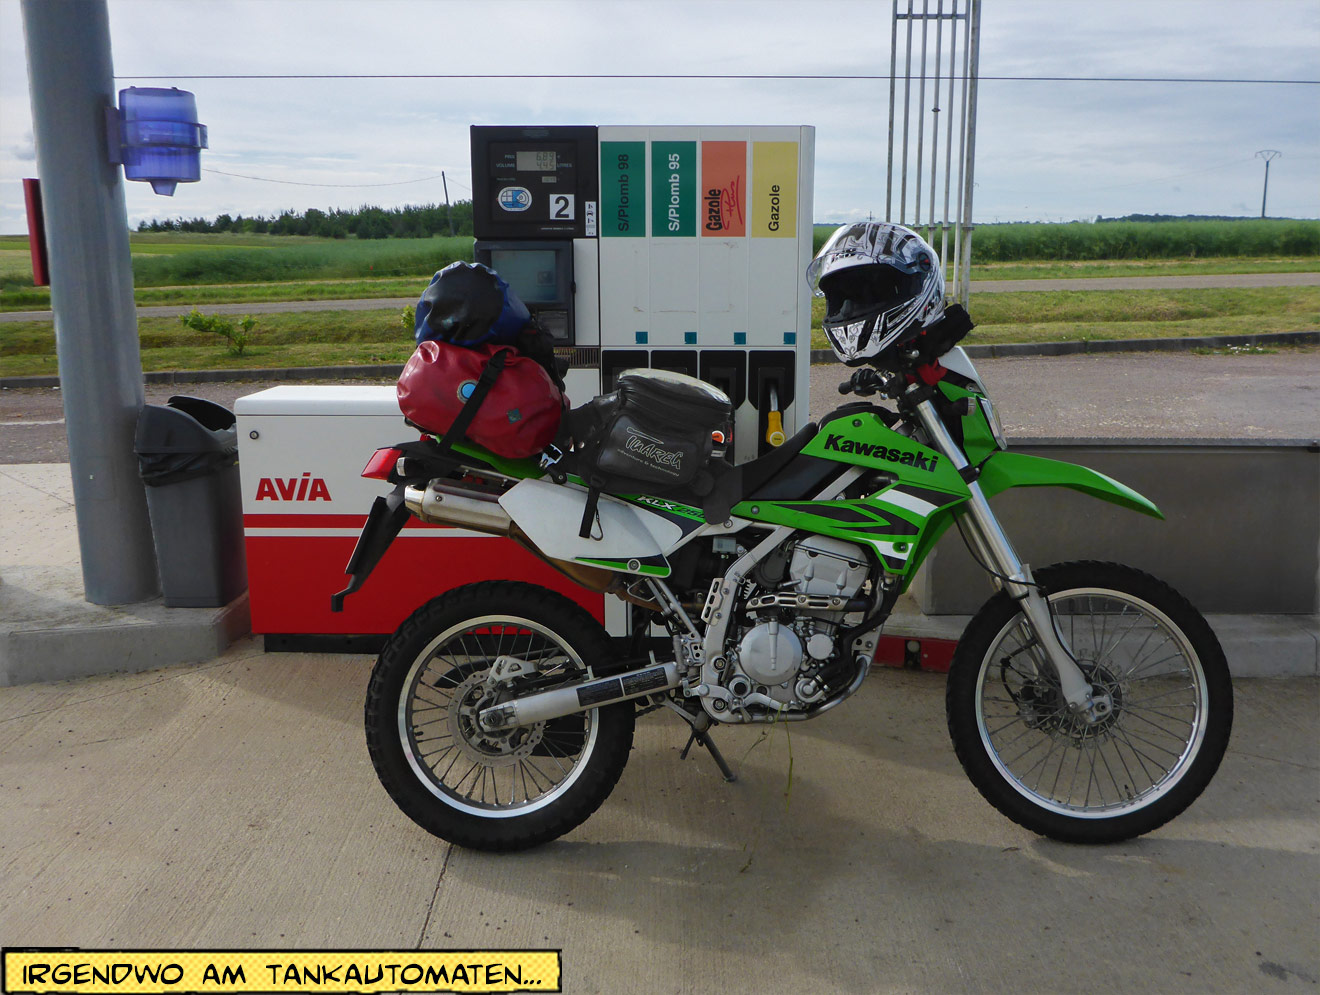 Motorrad an der Automatentankstelle